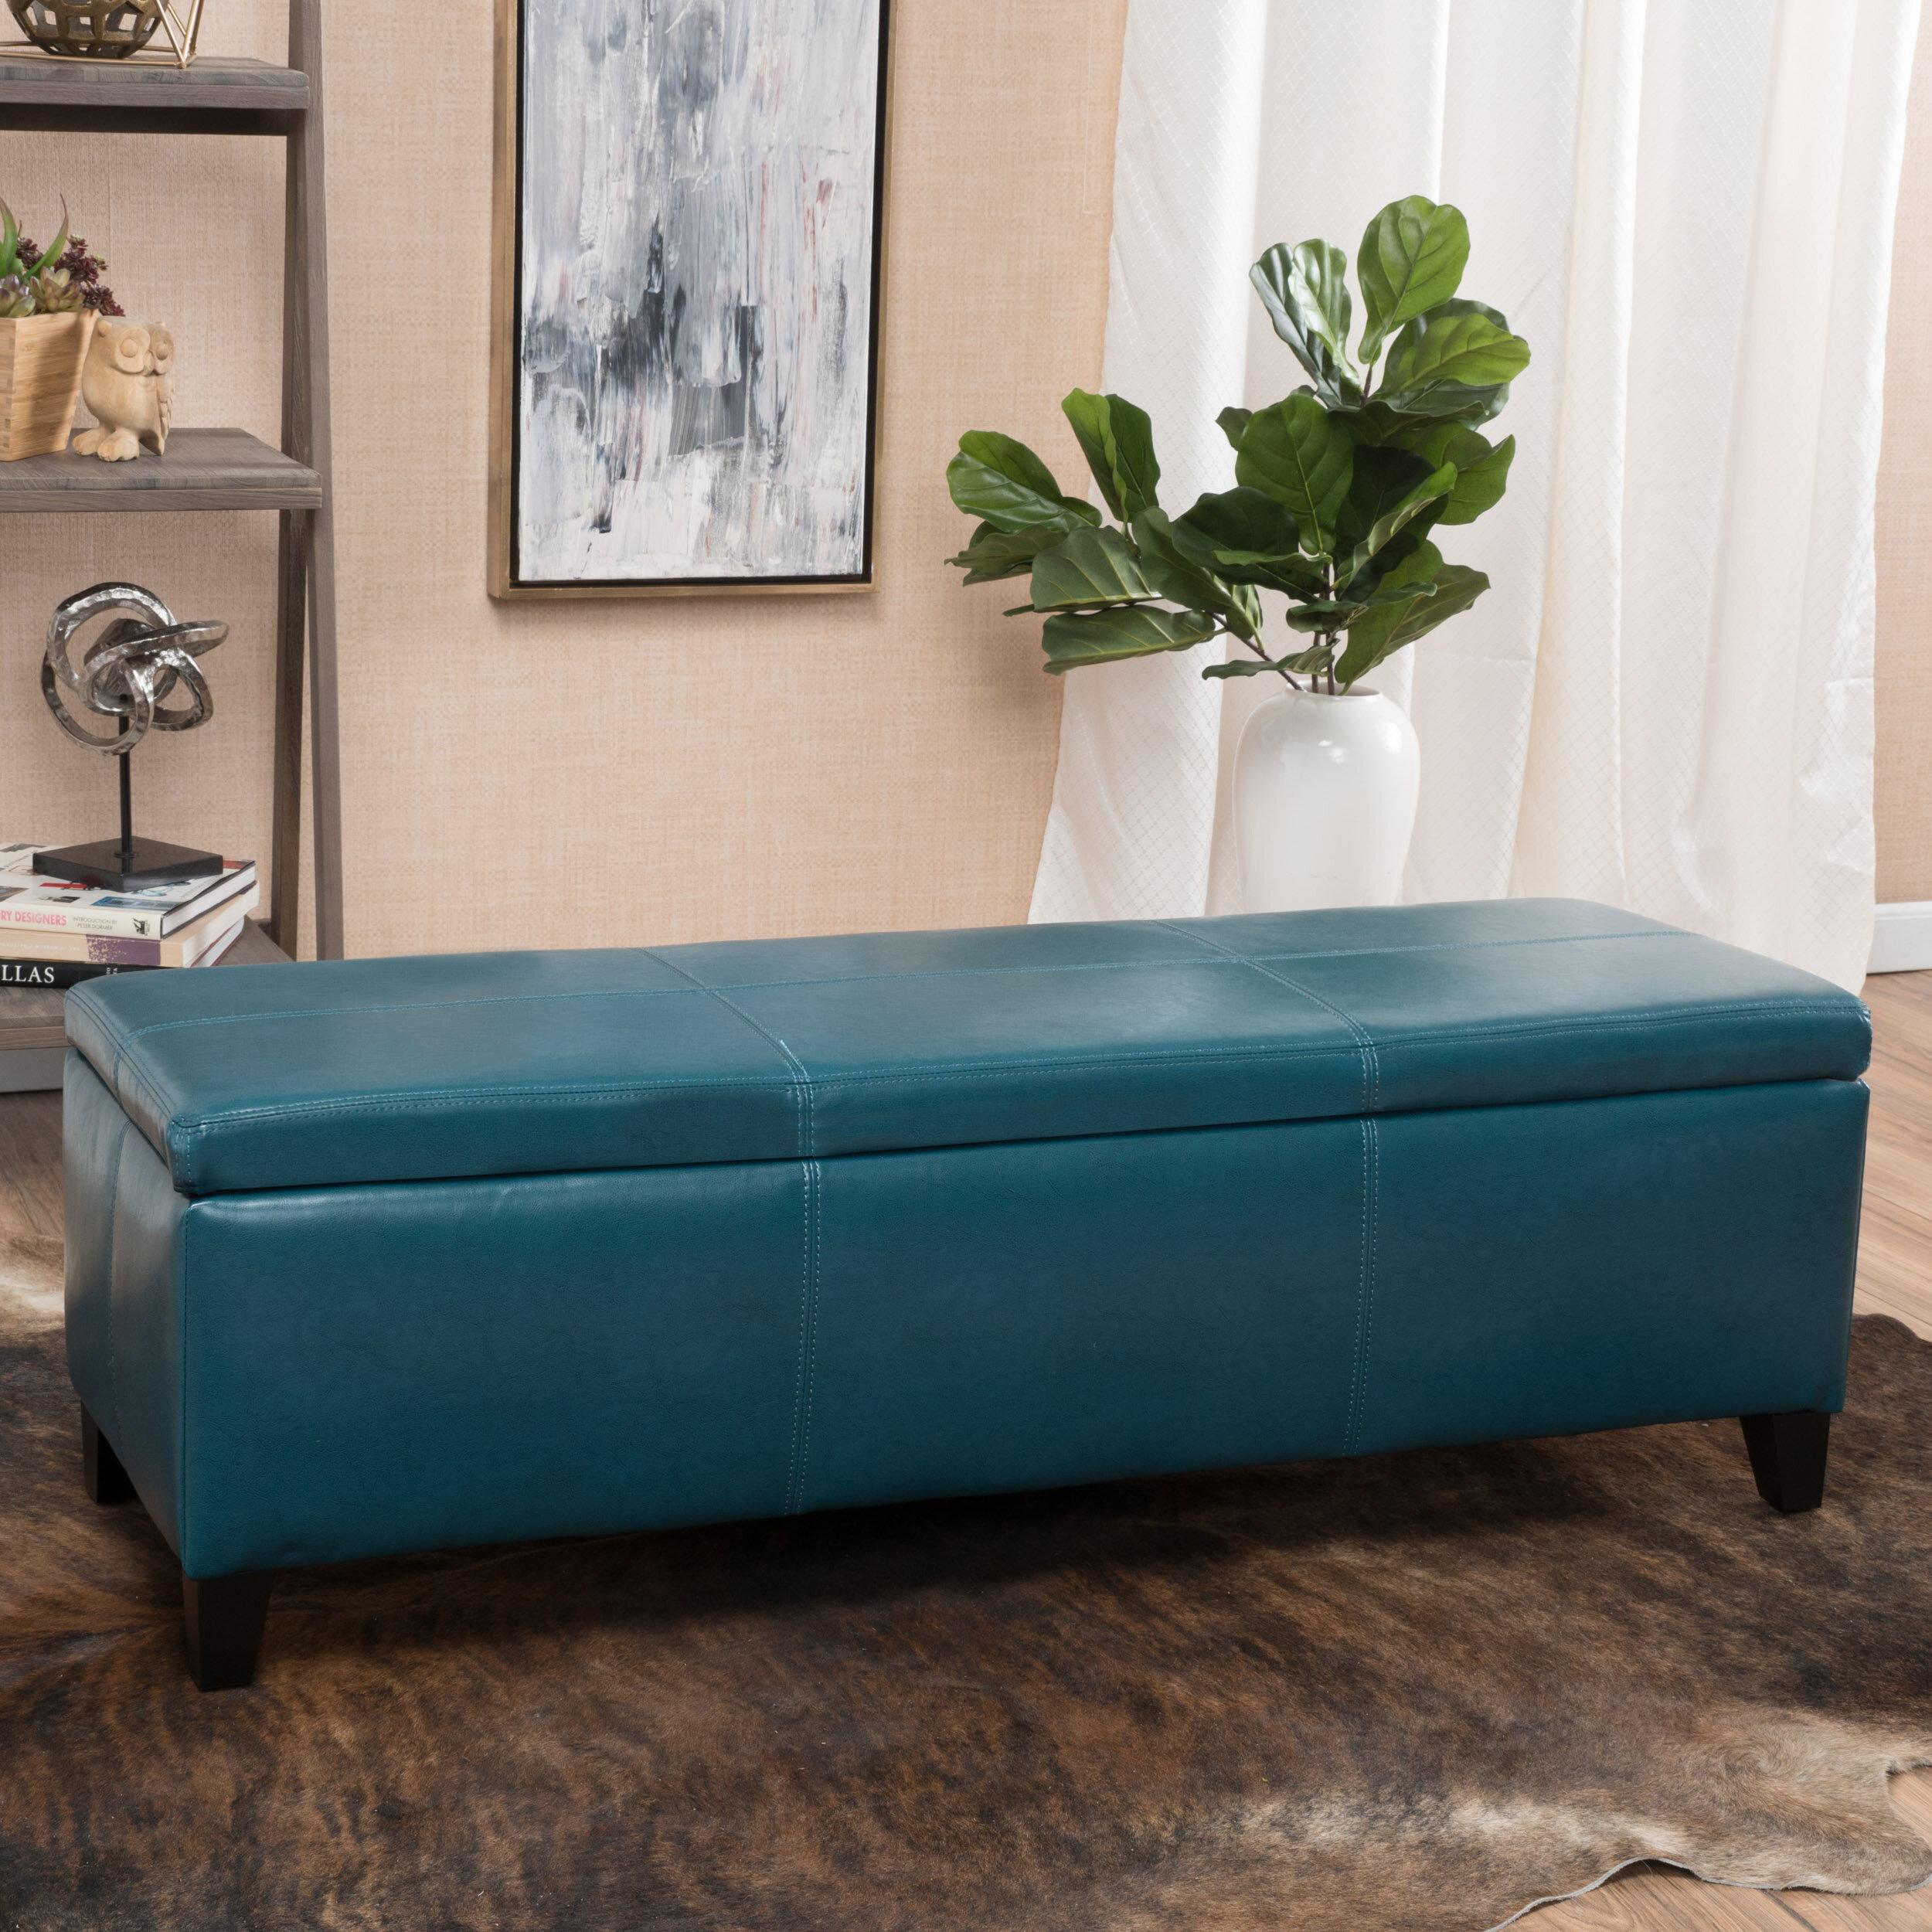 Surprising Denali Storage Ottoman Andrewgaddart Wooden Chair Designs For Living Room Andrewgaddartcom